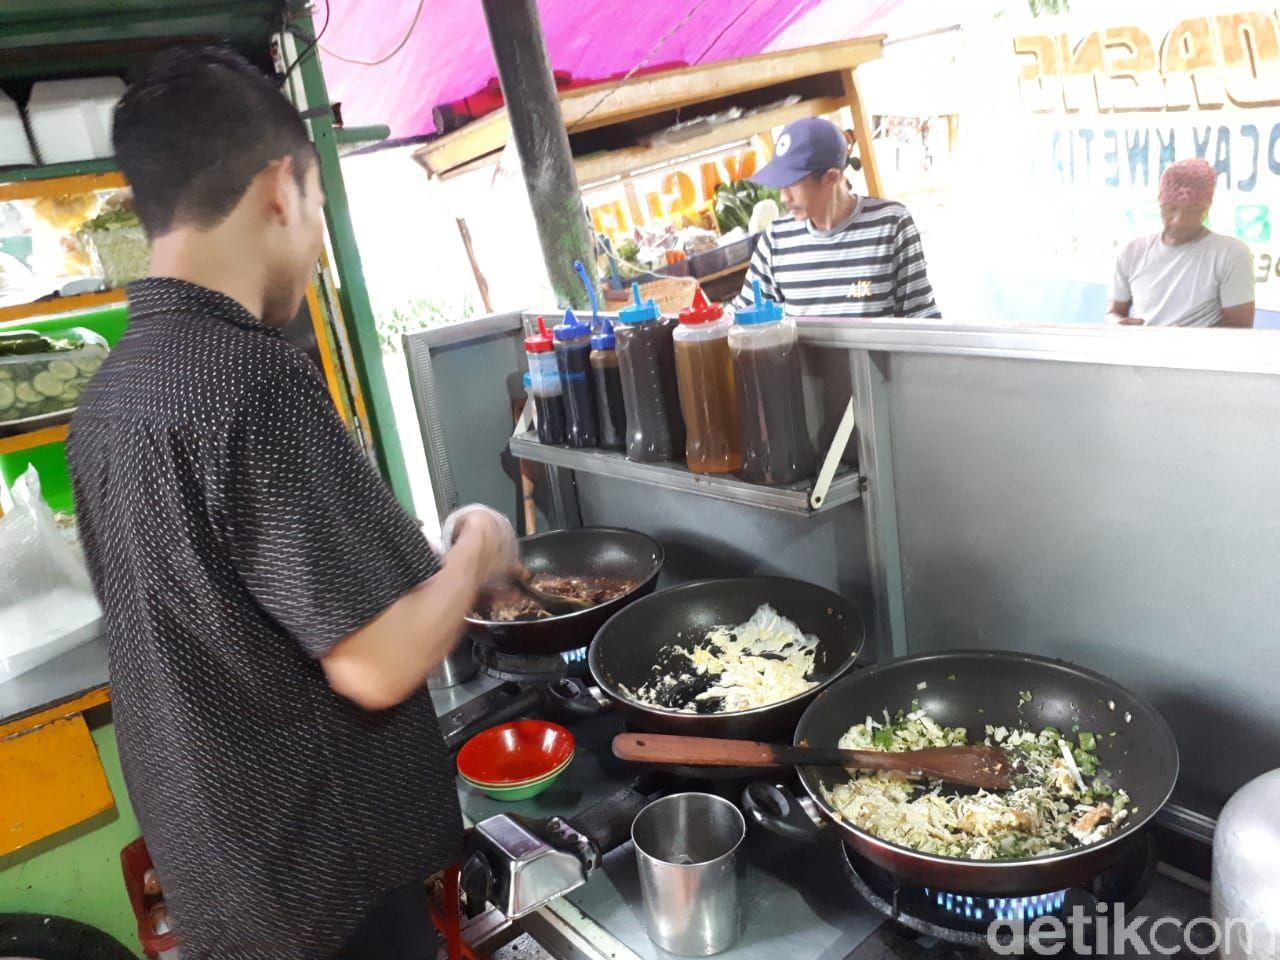 Bubur Goreng Bang Juna yang Unik di Jagakarsa, Jakarta Selatan